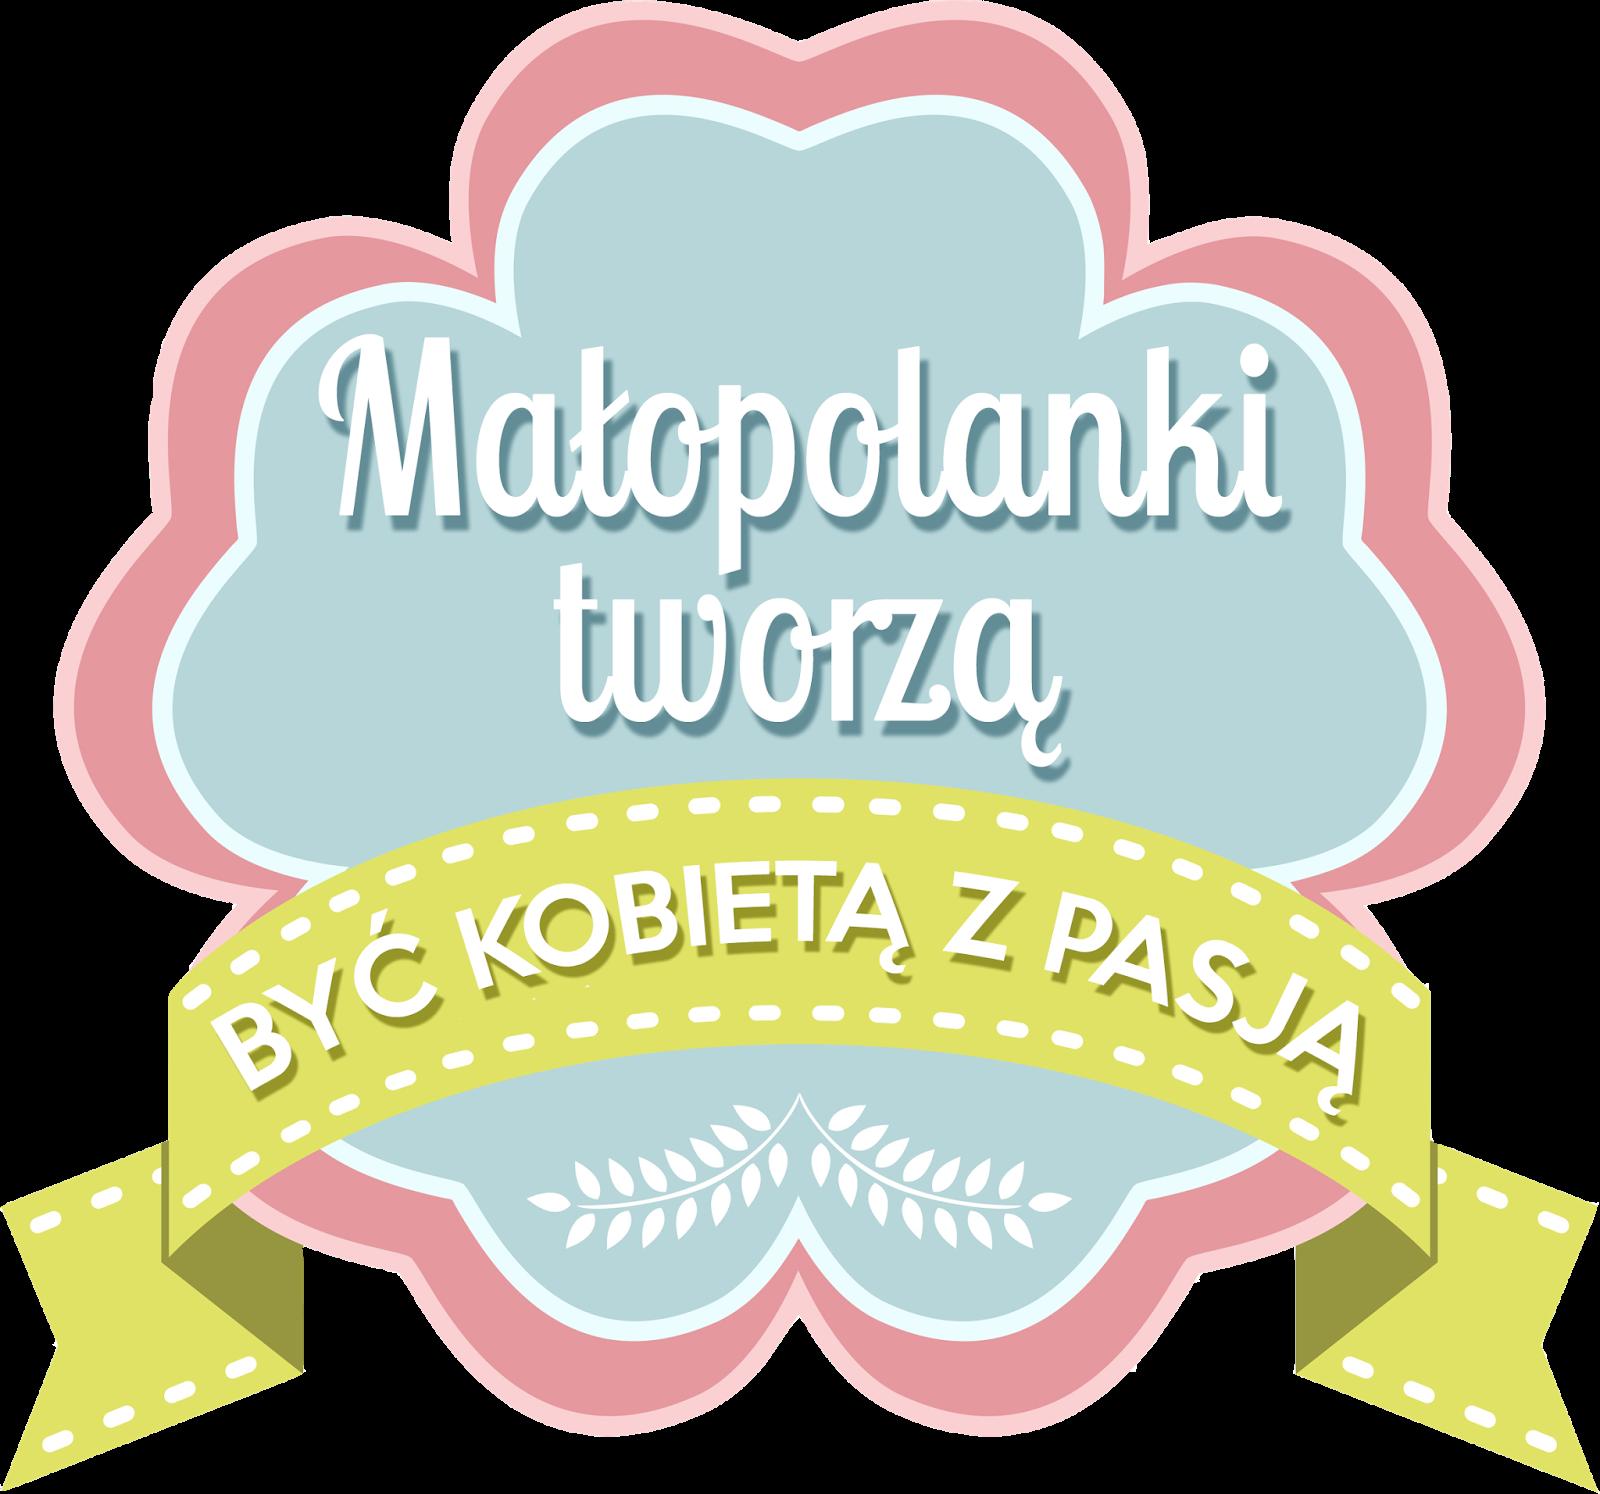 http://malopolankitworza.blogspot.com/